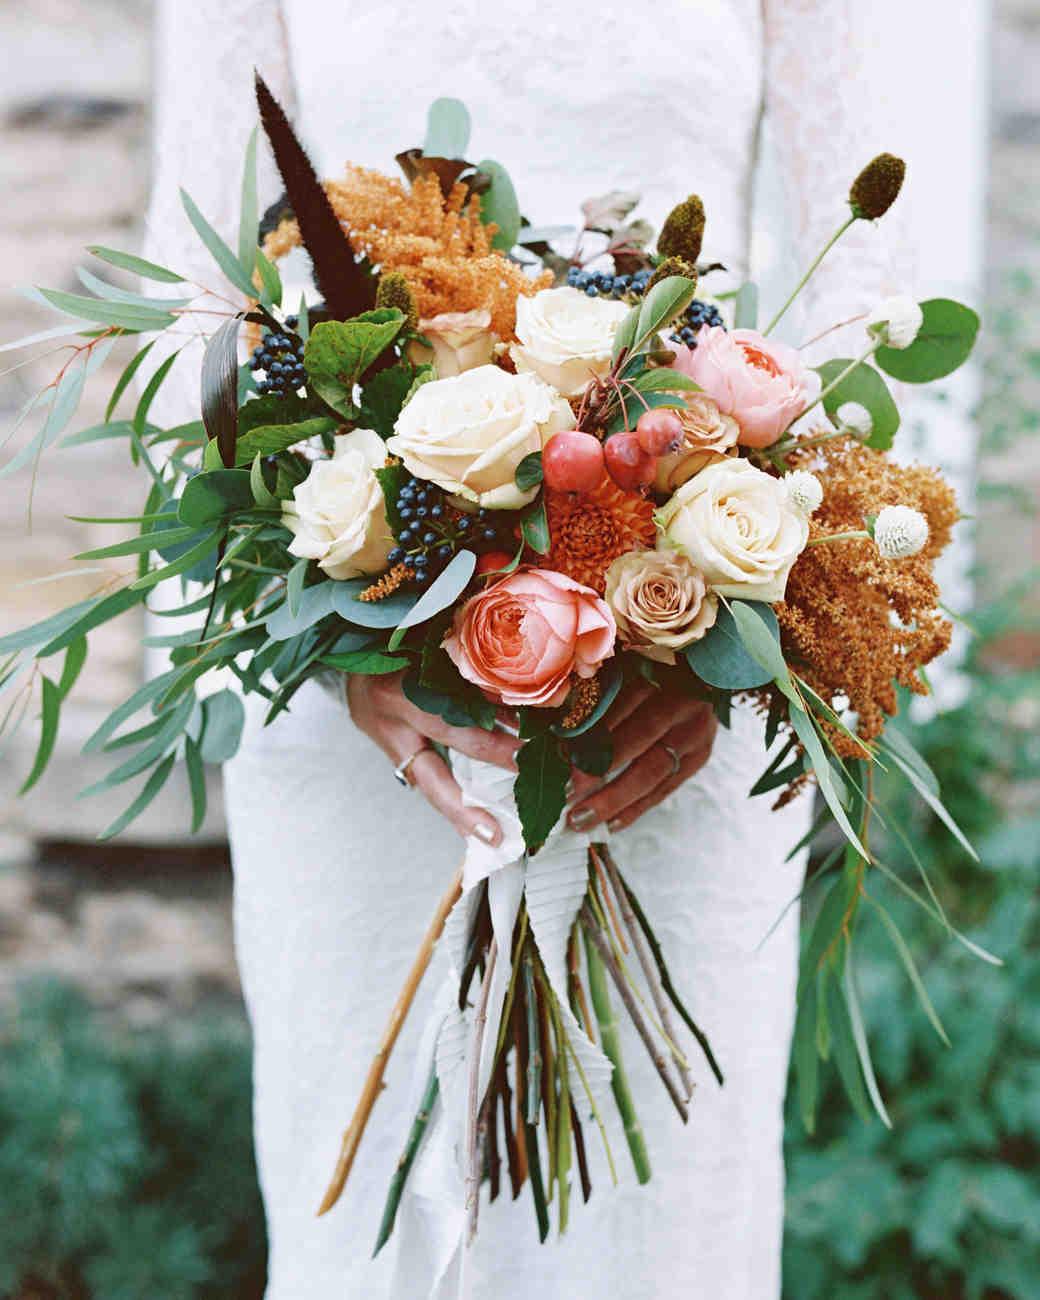 Wedding Flowers Autumn: 53 Gorgeous Fall Wedding Bouquets